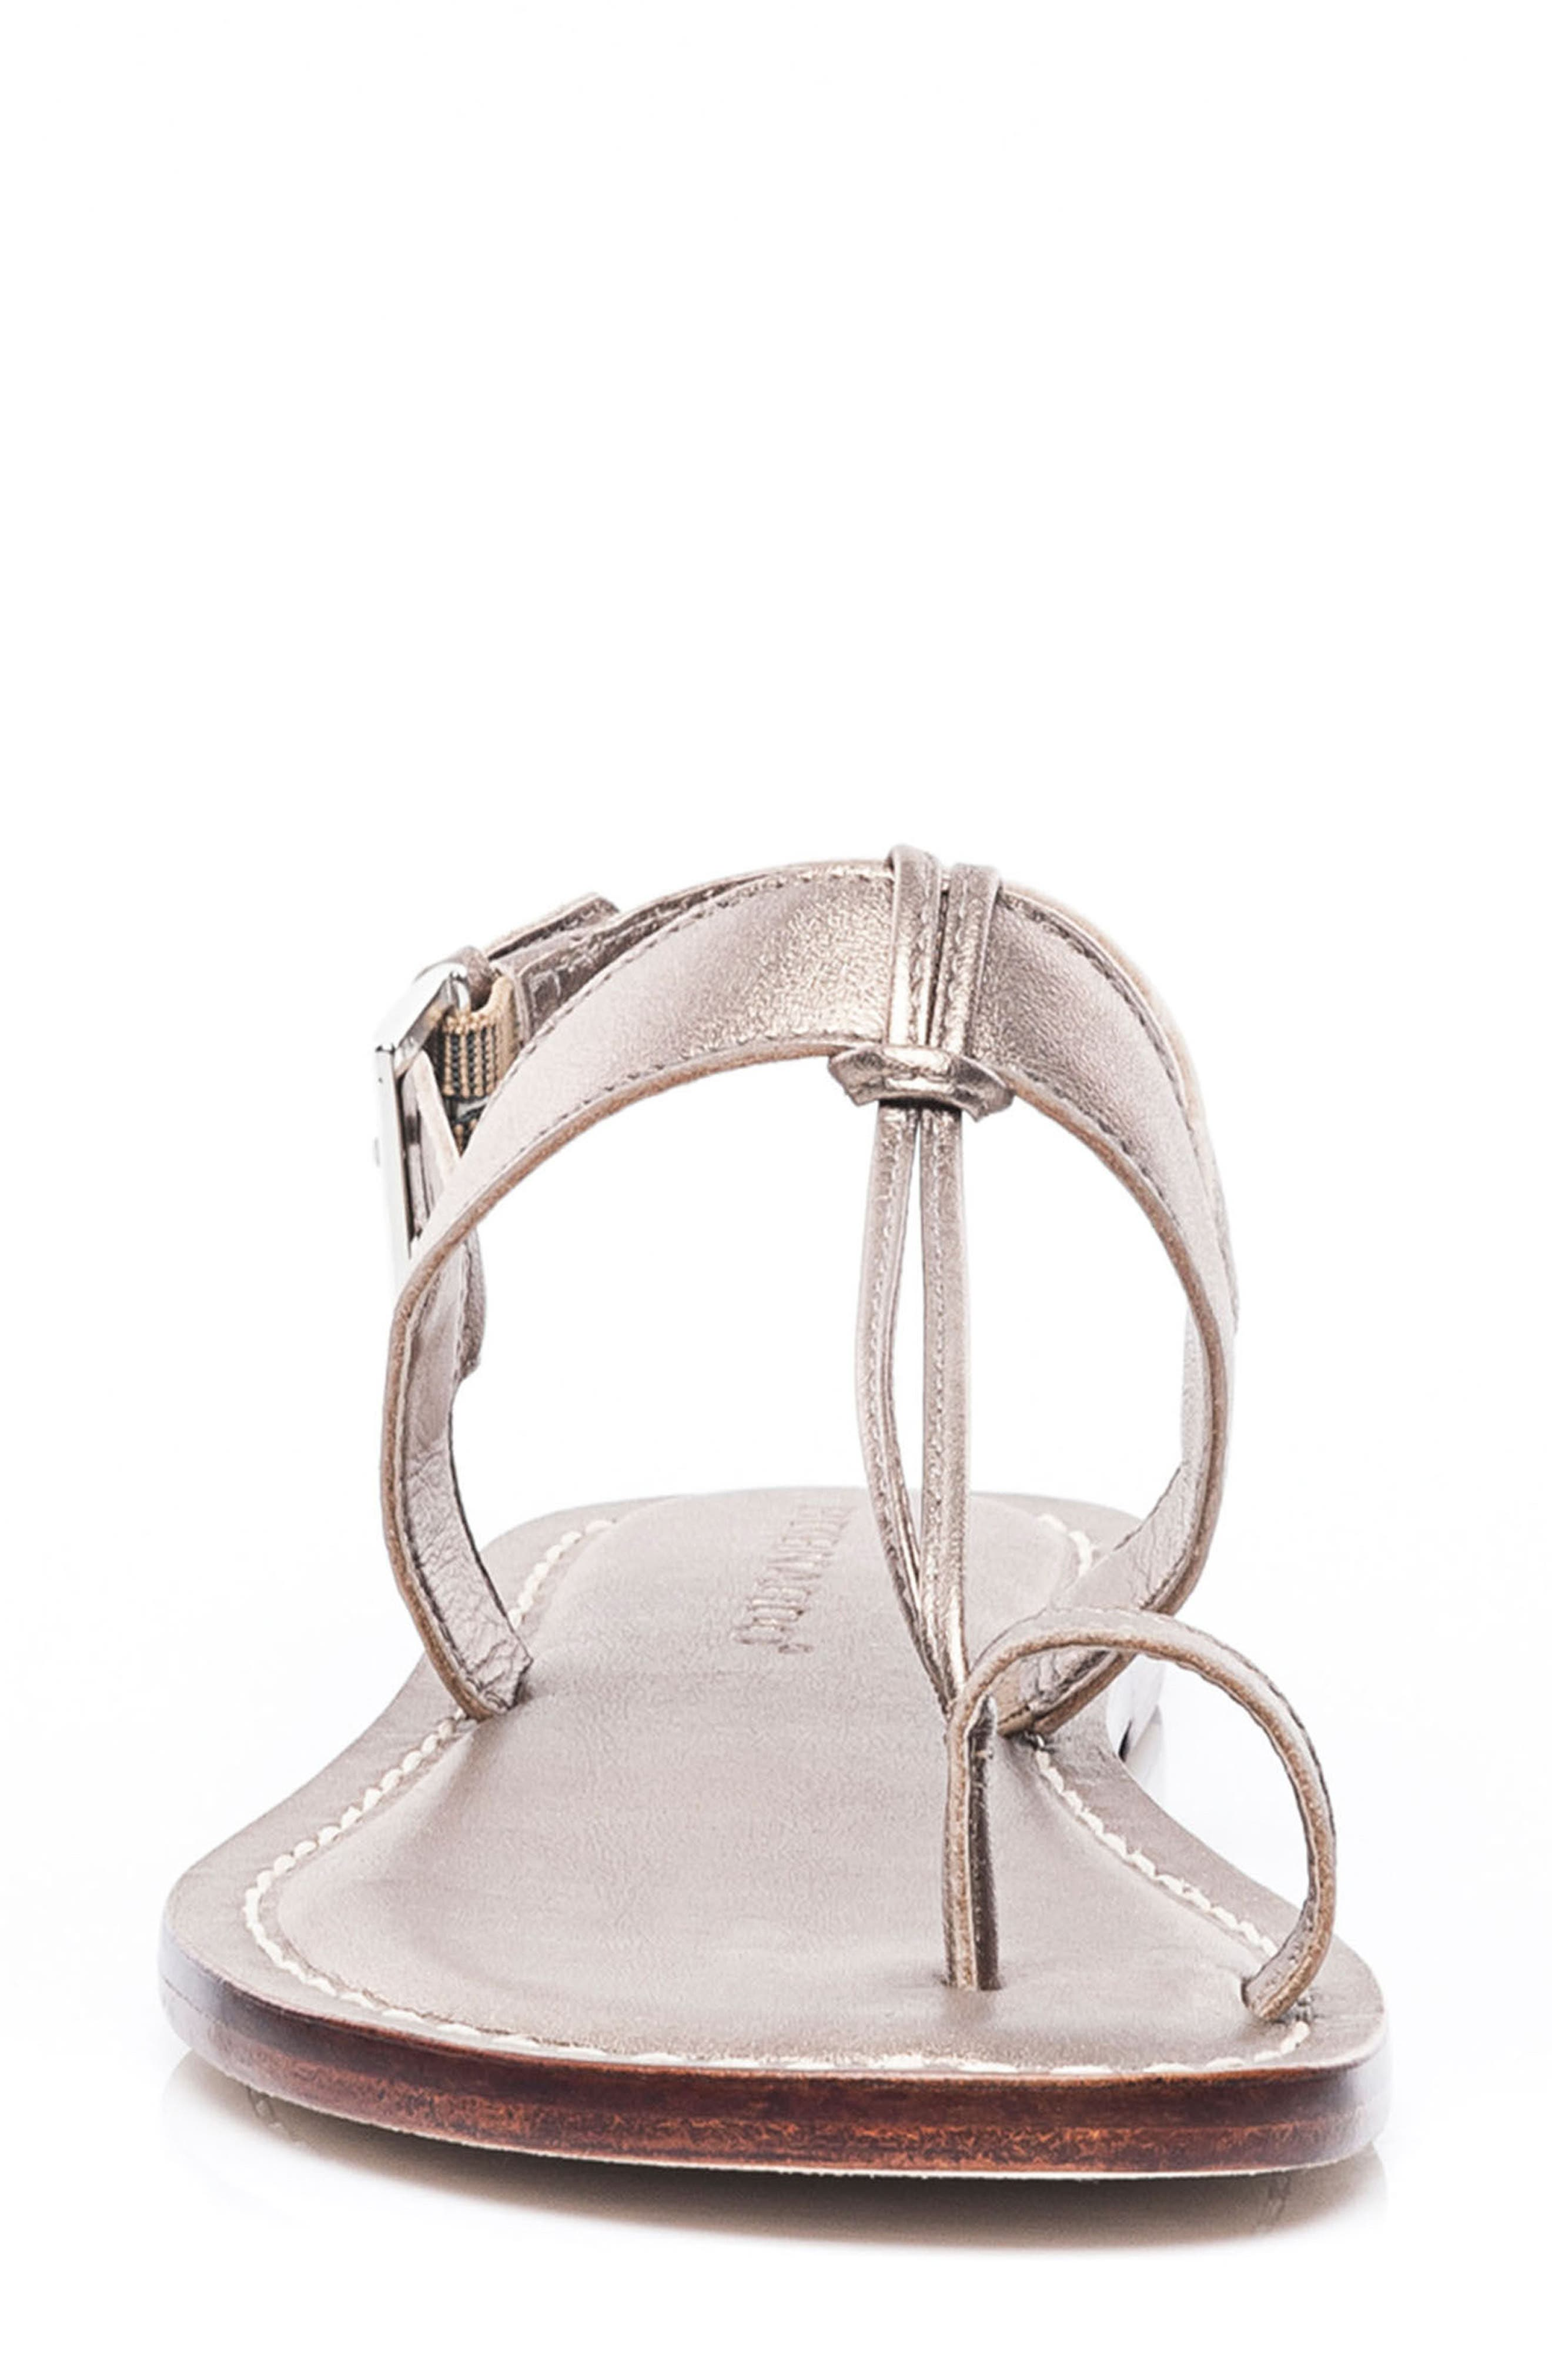 Bernardo Maverick Leather Sandal,                             Alternate thumbnail 4, color,                             Platinum Leather